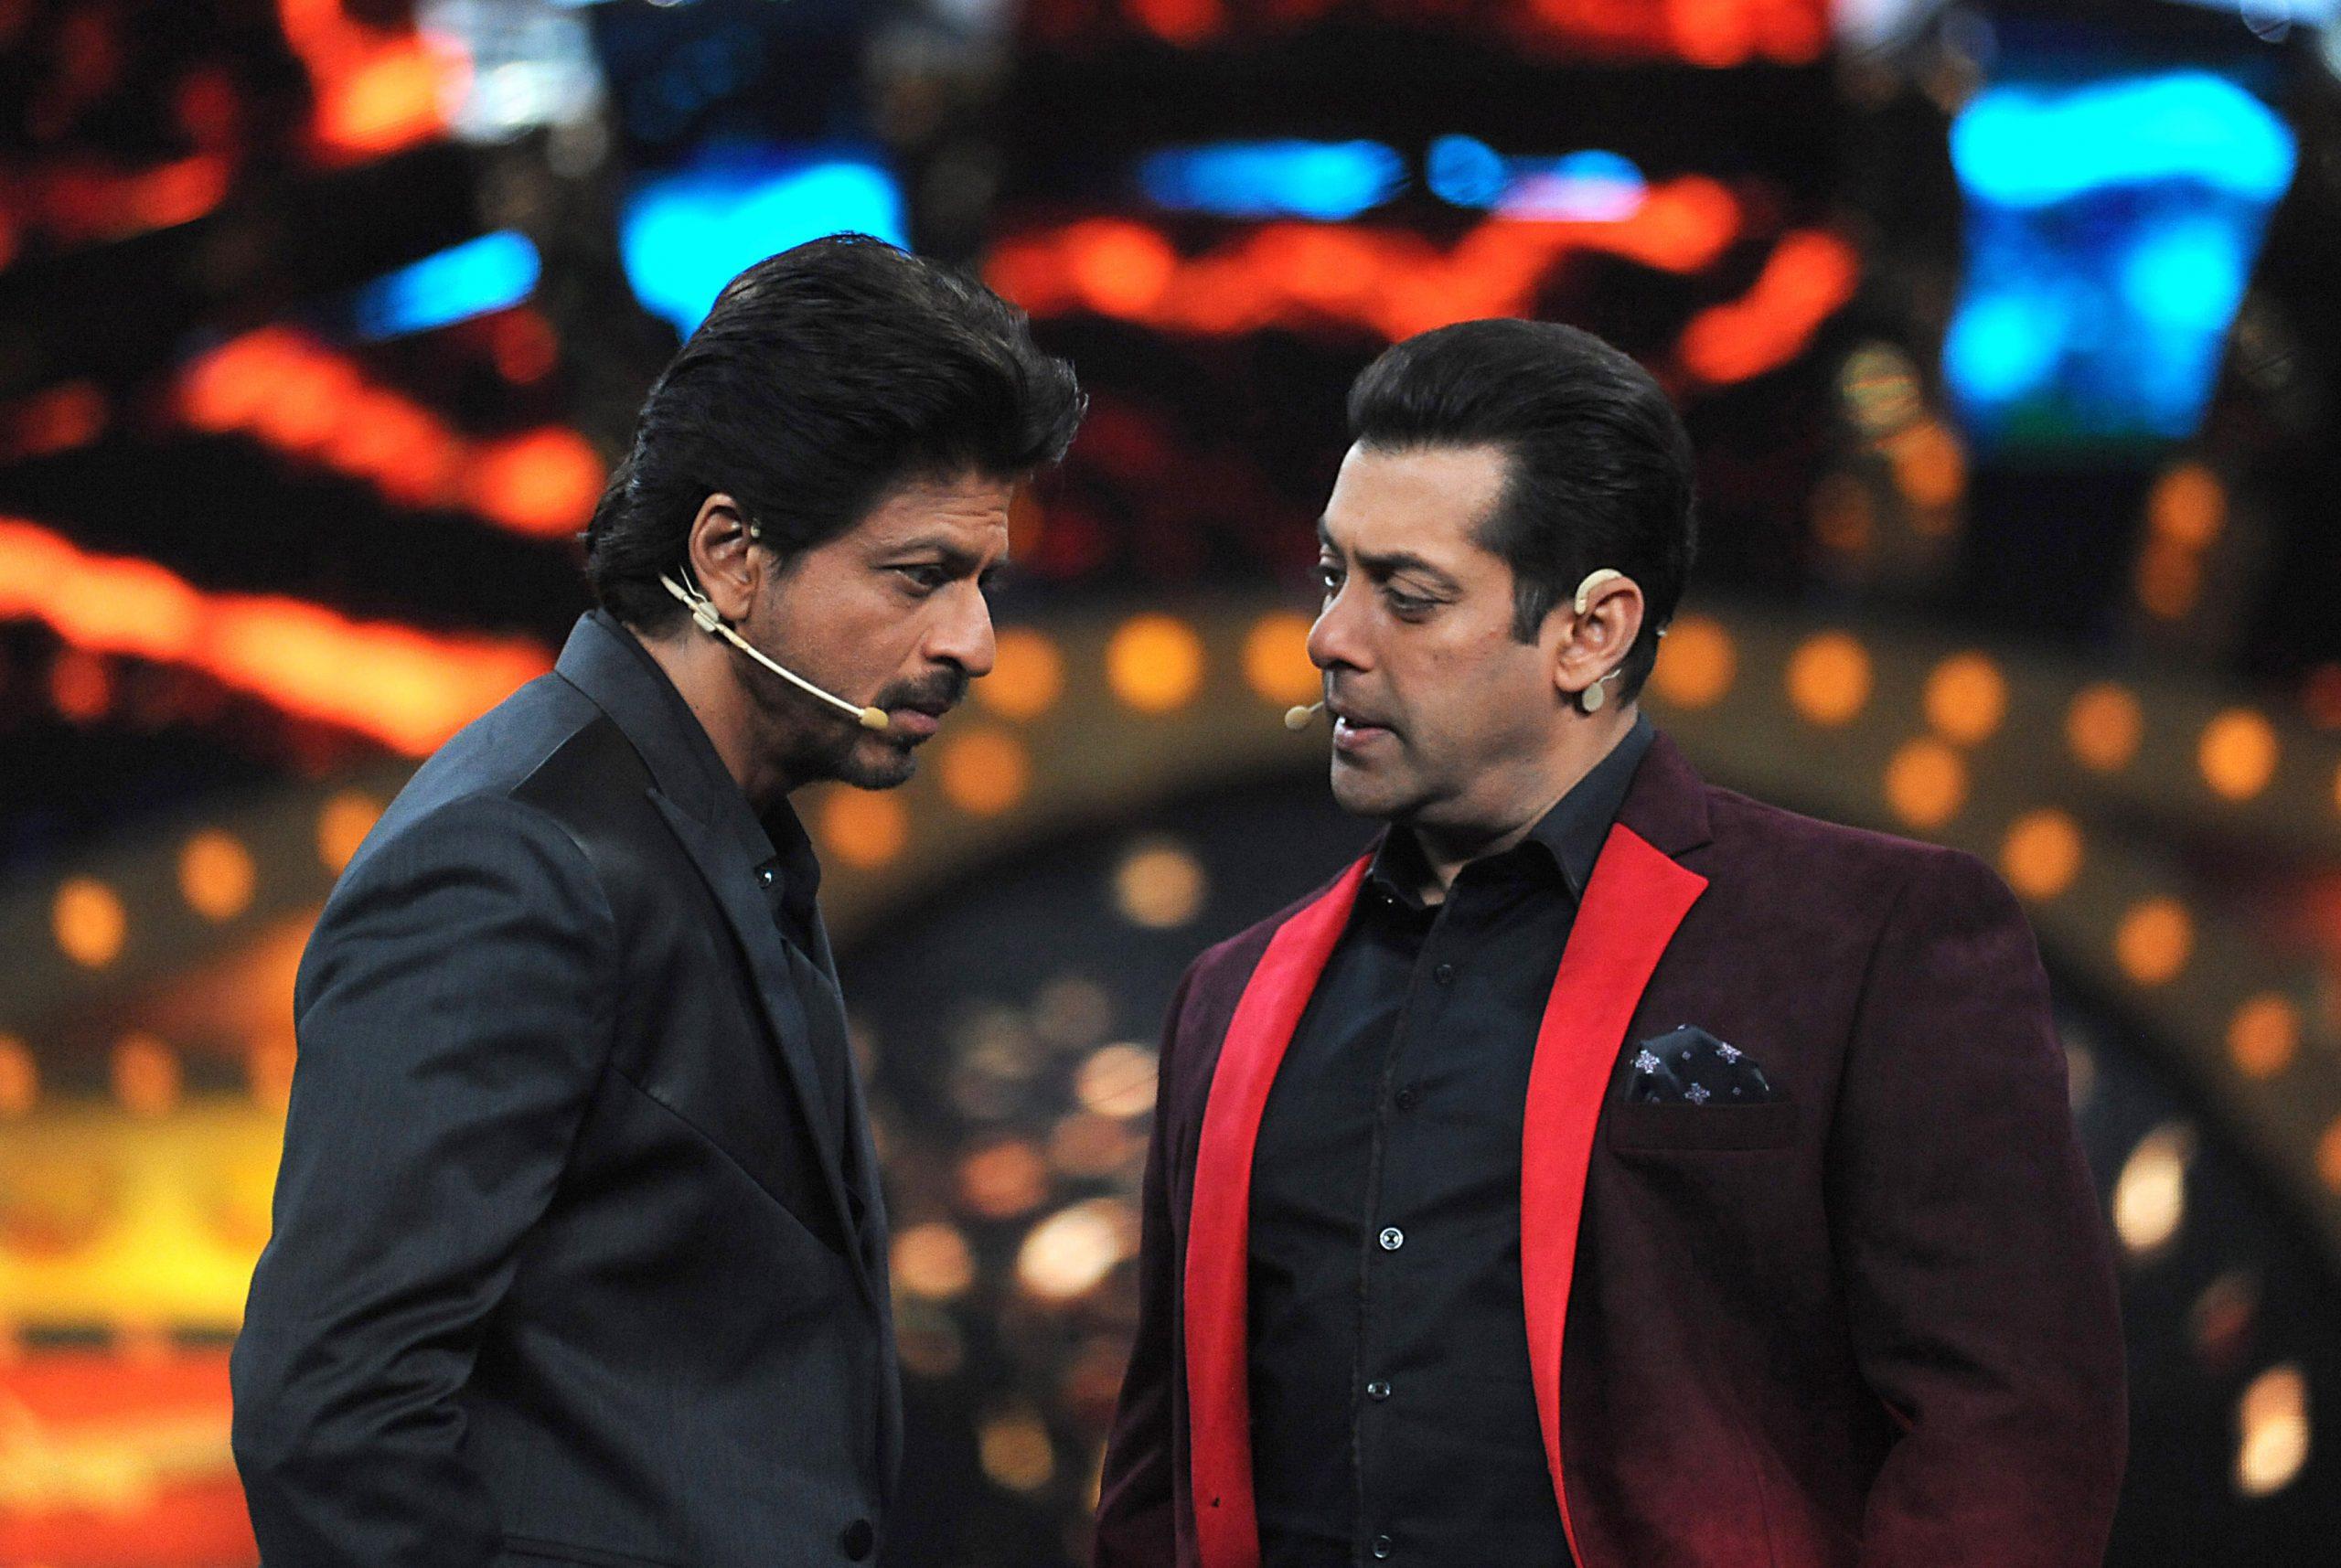 Shah Rukh Khan (L) and Salman Khan (Photo credit: SUJIT JAISWAL/AFP via Getty Images)